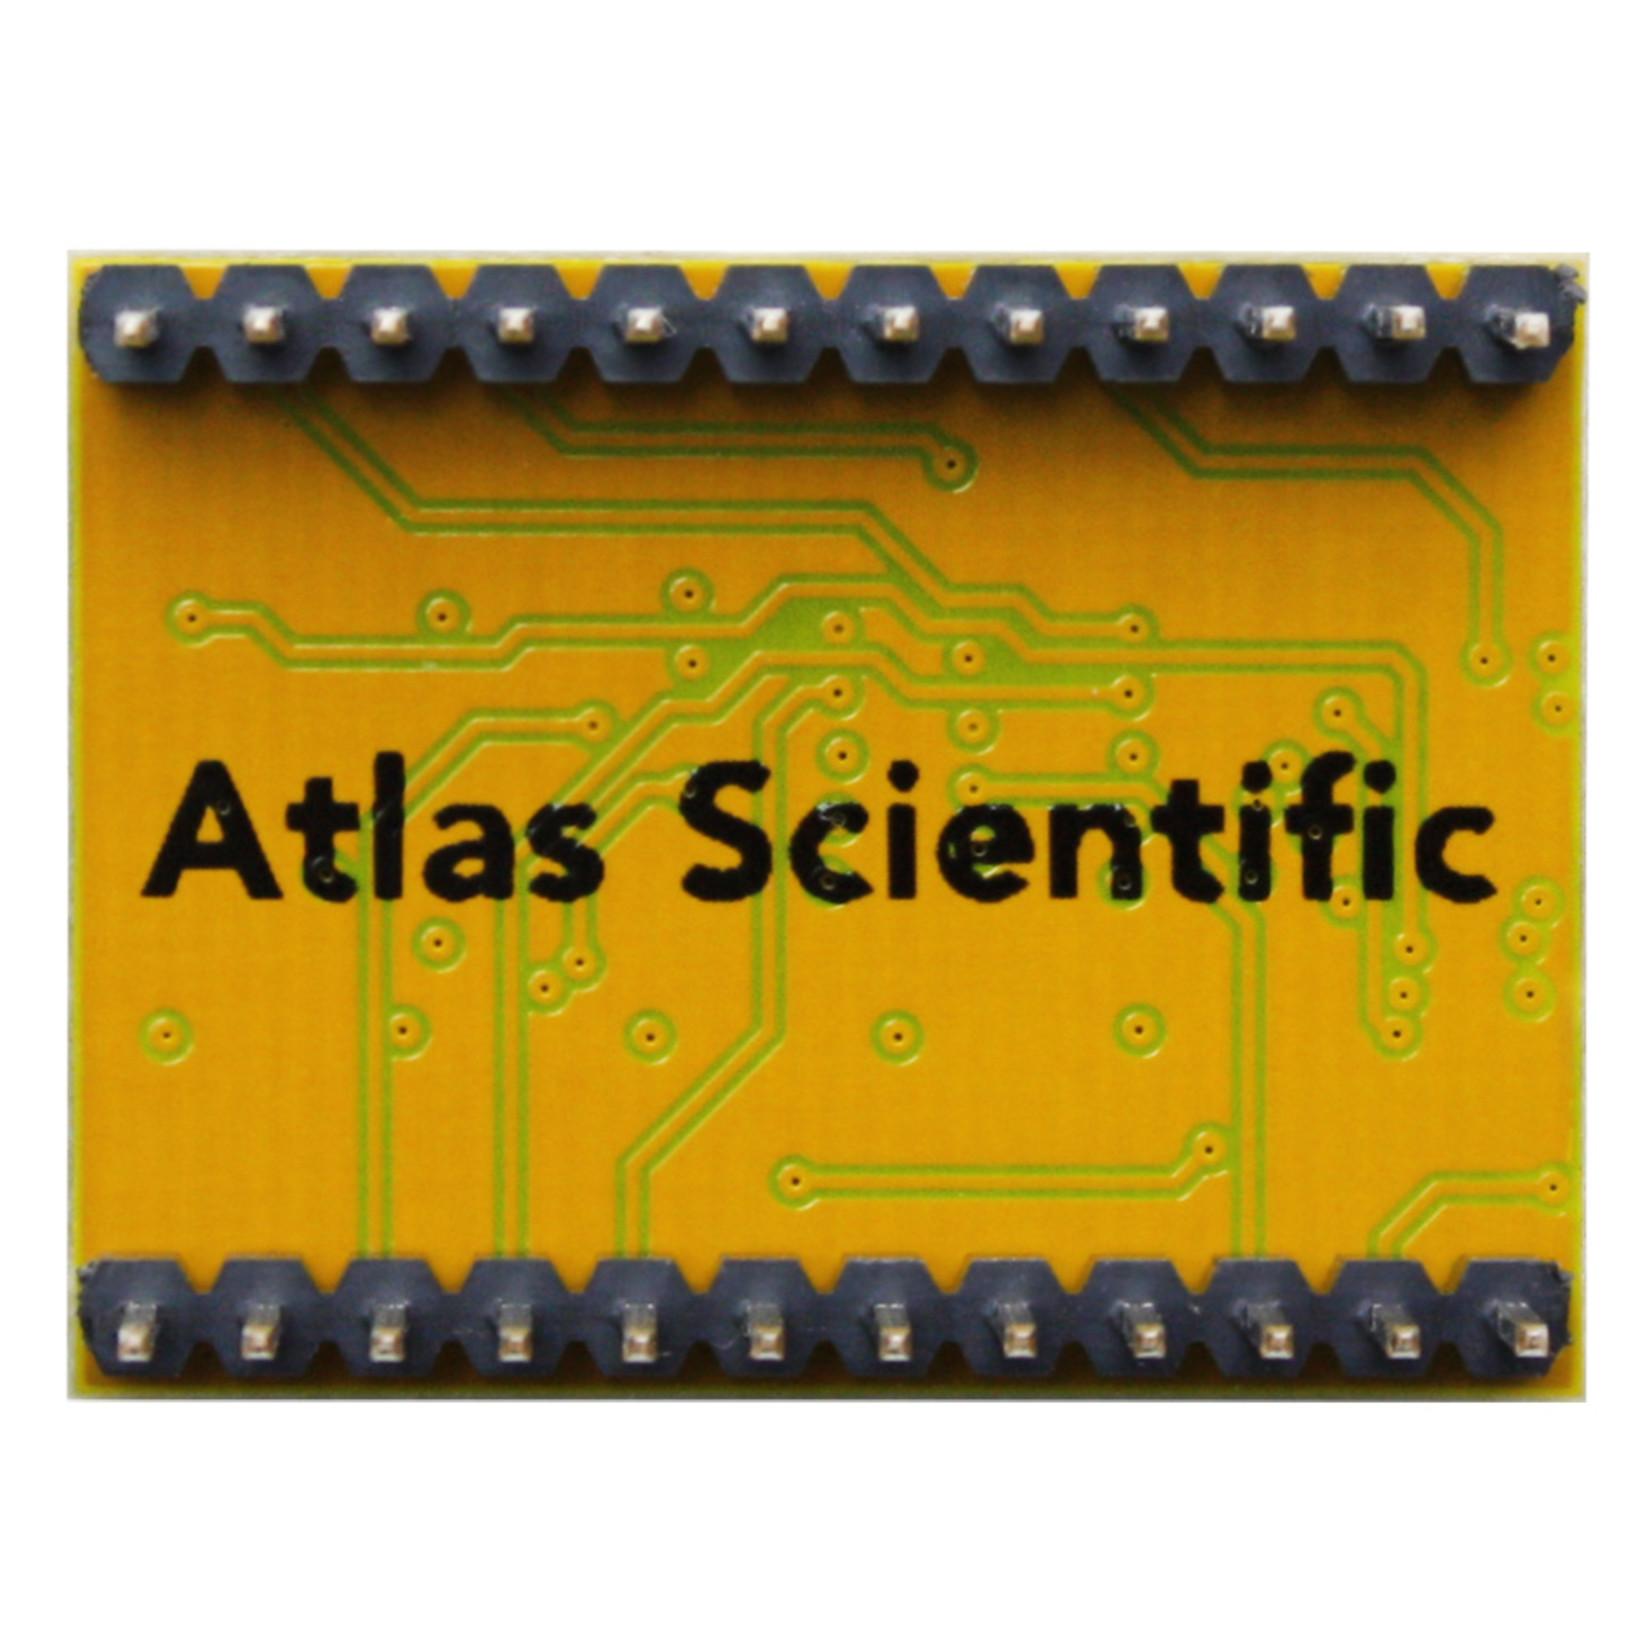 Atlas Scientific 8:1 Seriële poort expander